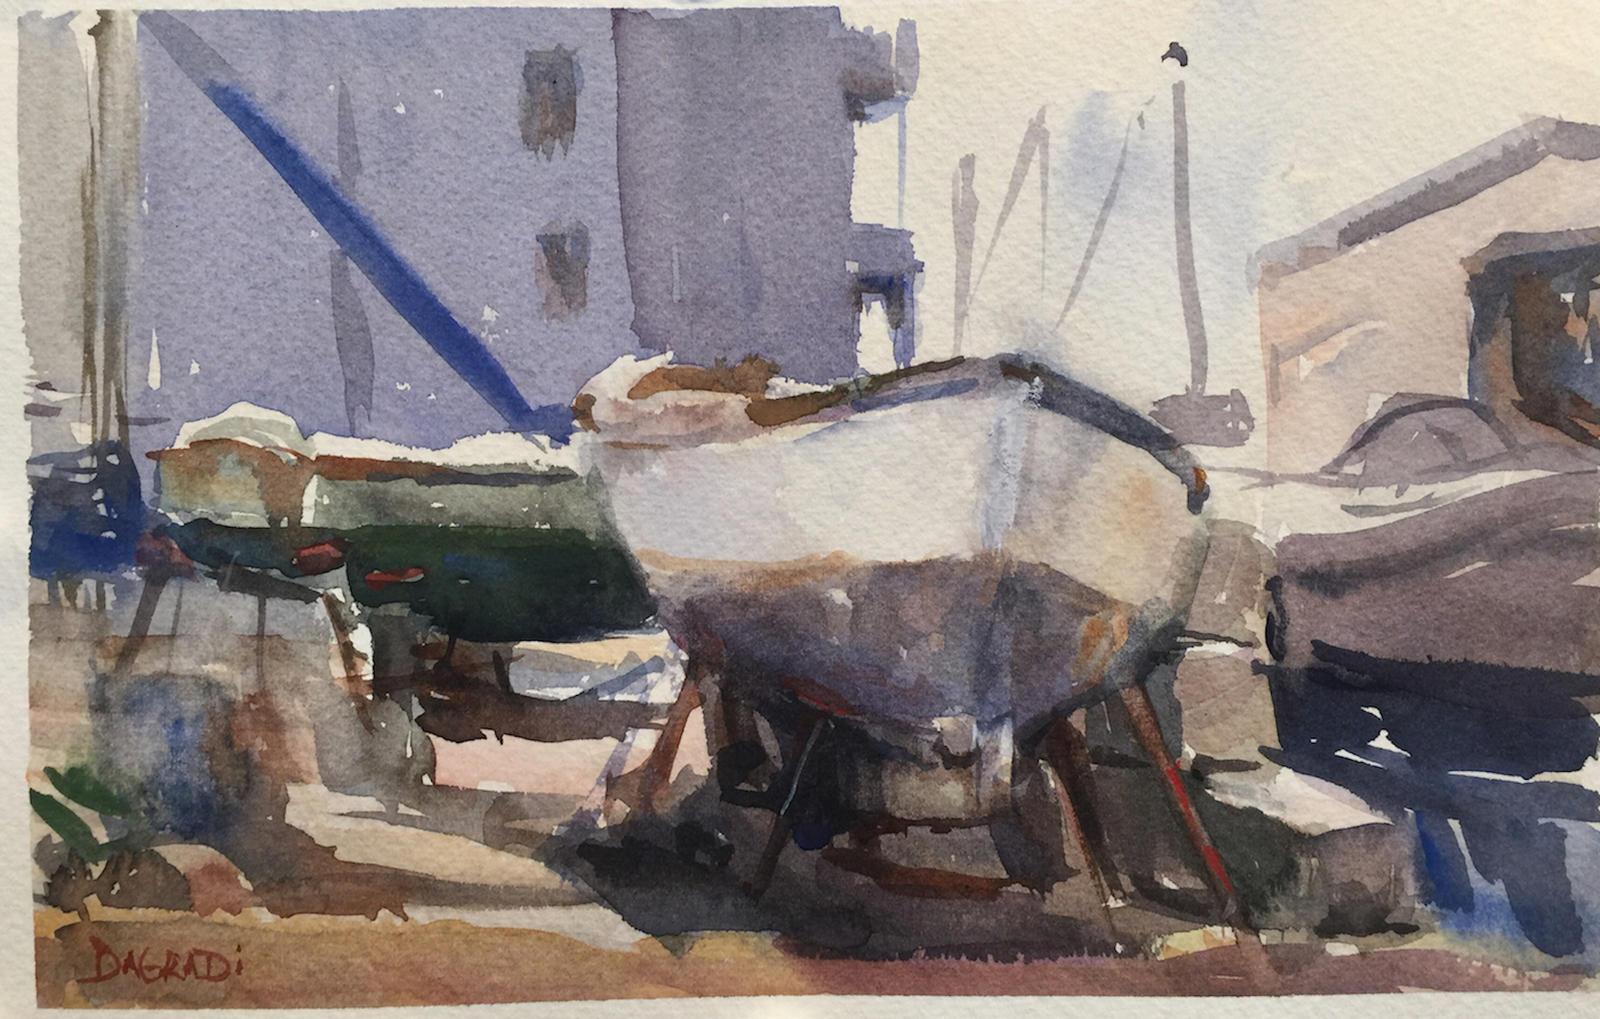 Joan DaGradi - Schubert's Boat Yard